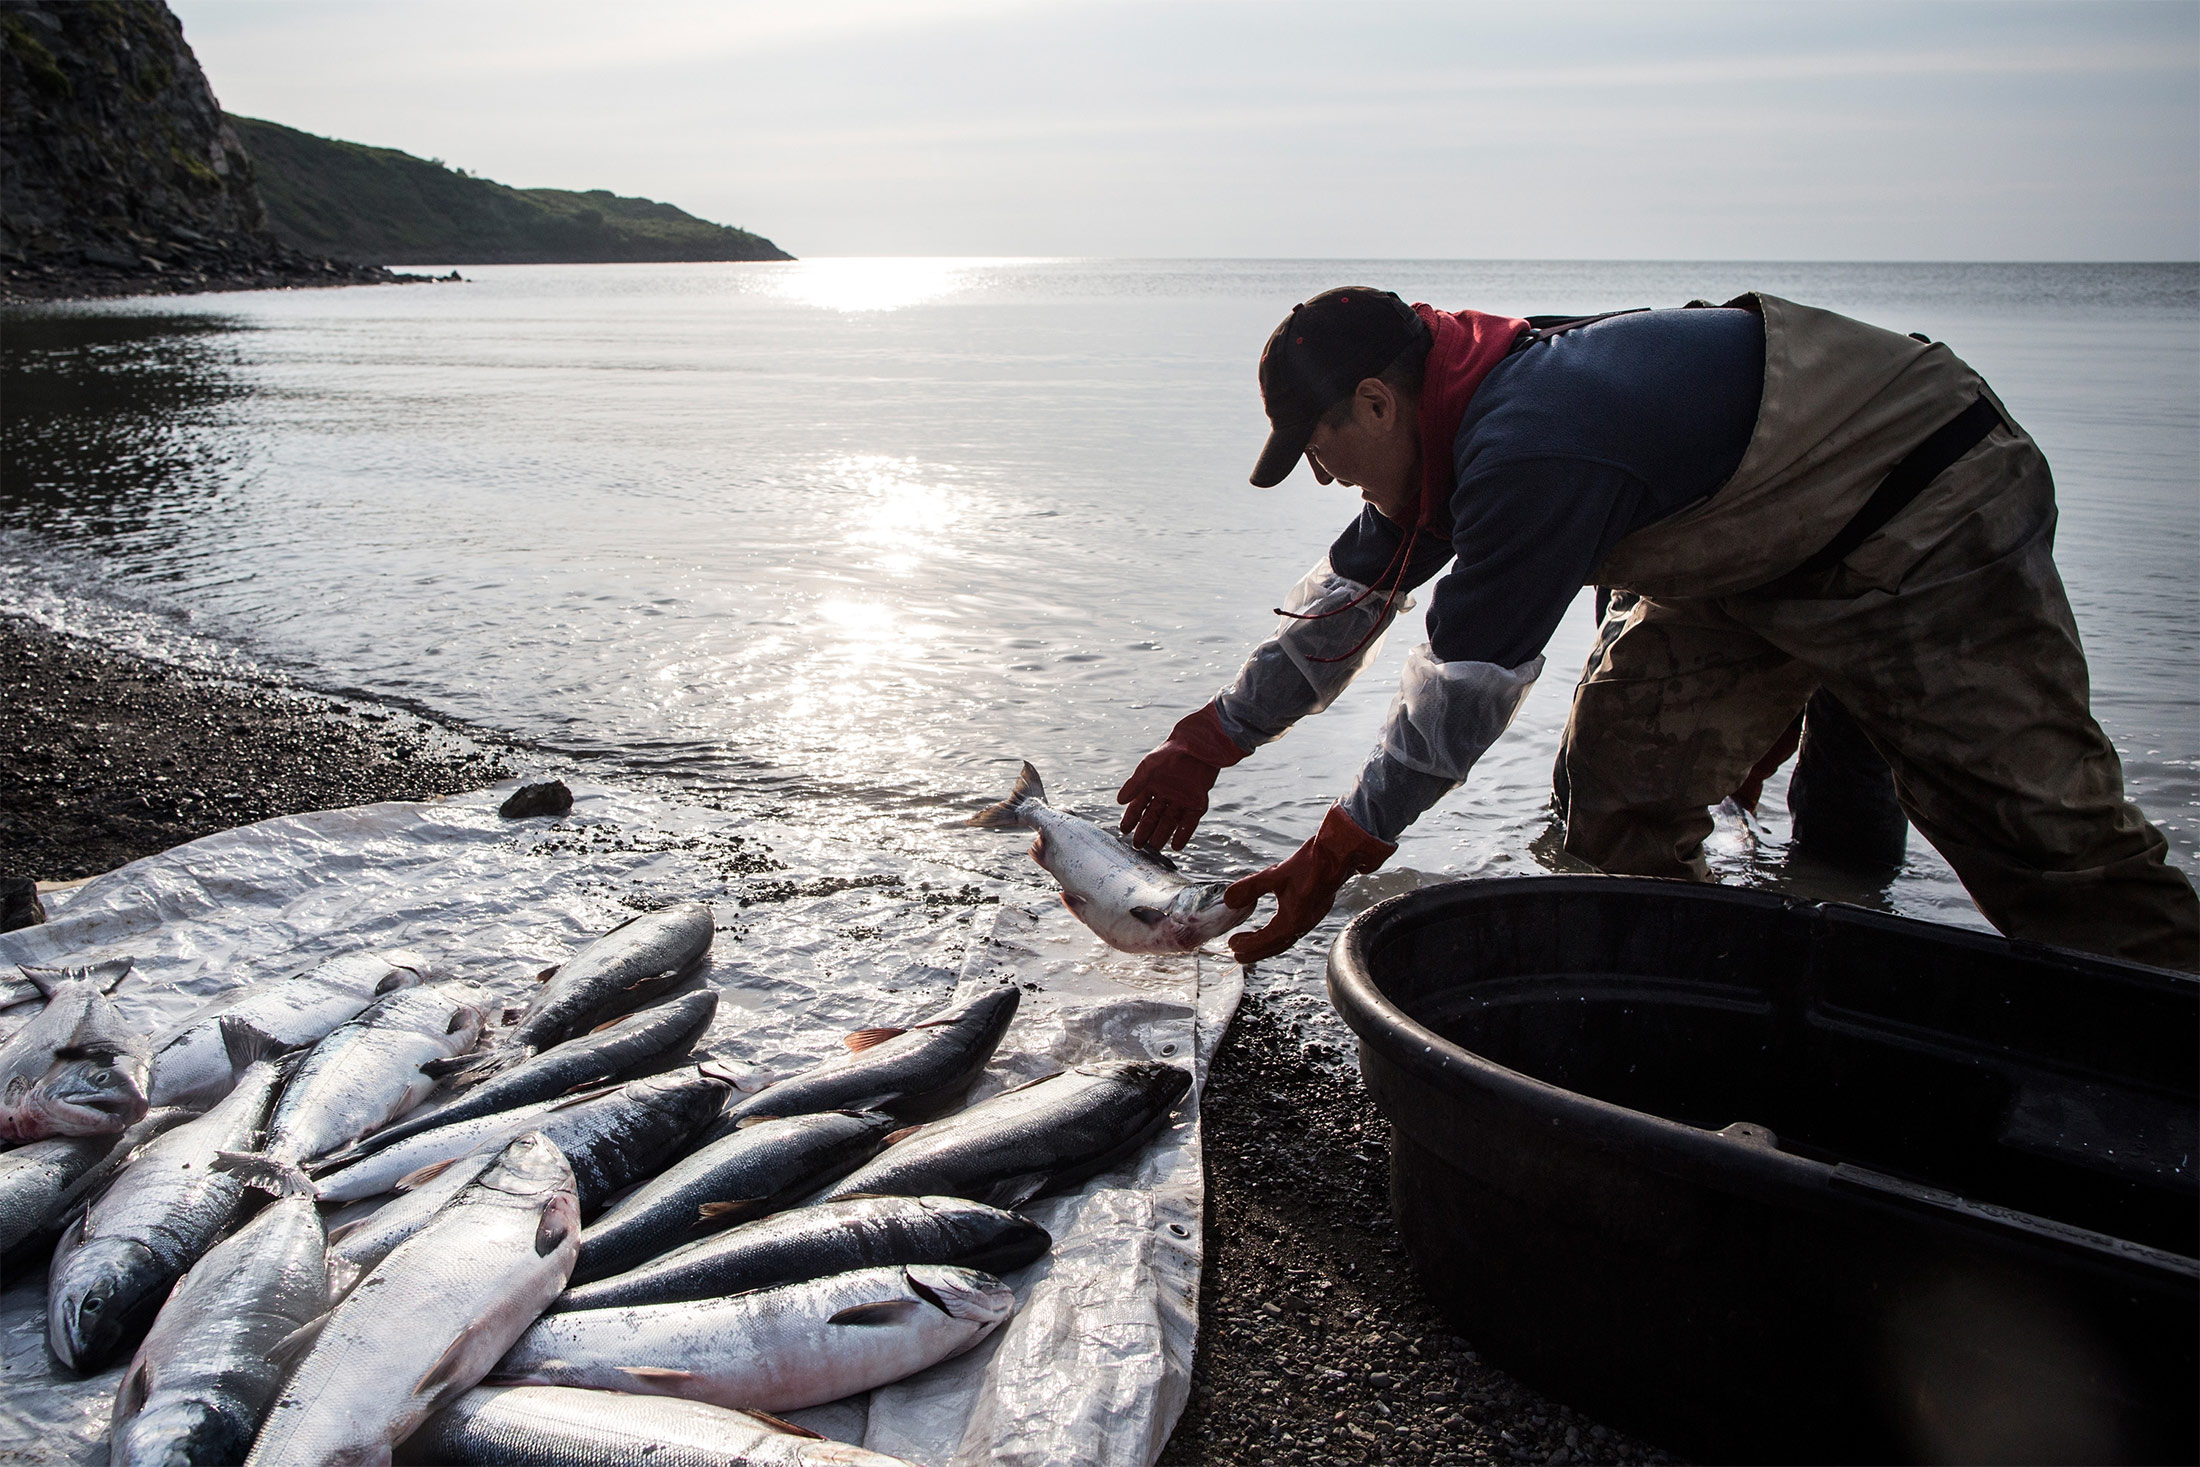 A fisherman washes freshly caught salmon in Newtok, Alaska.